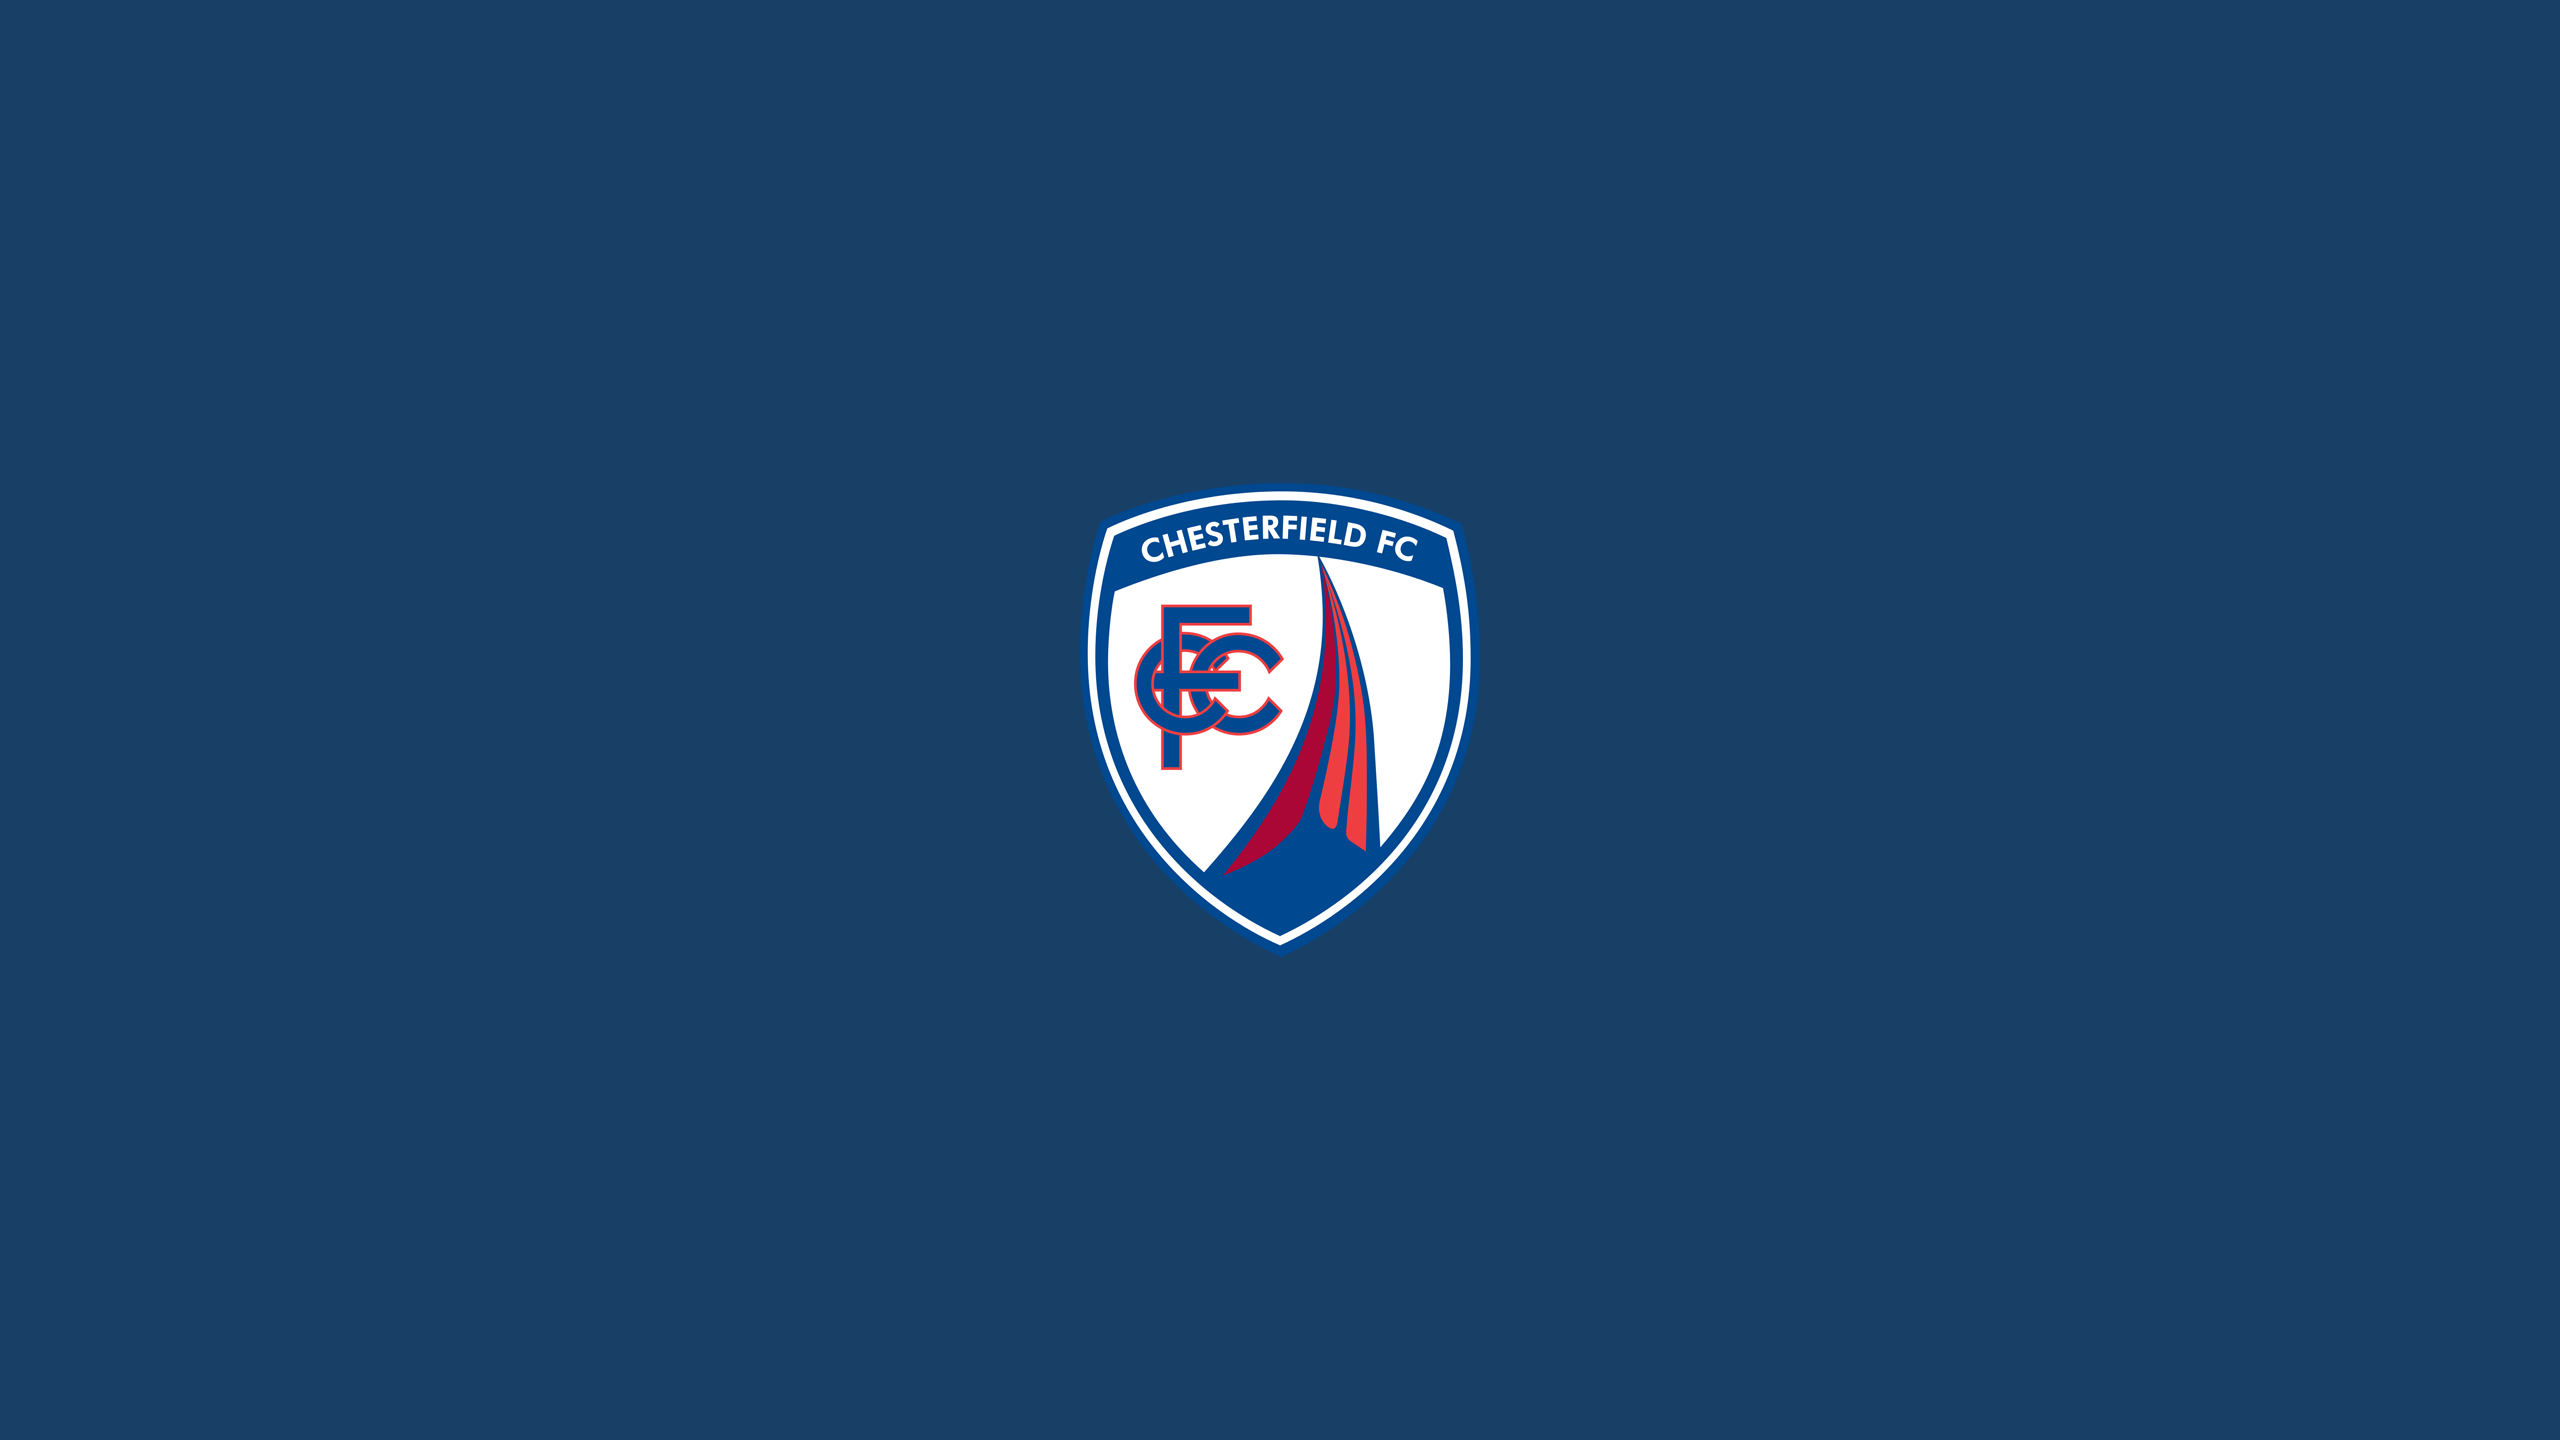 Chesterfield FC (Alt)